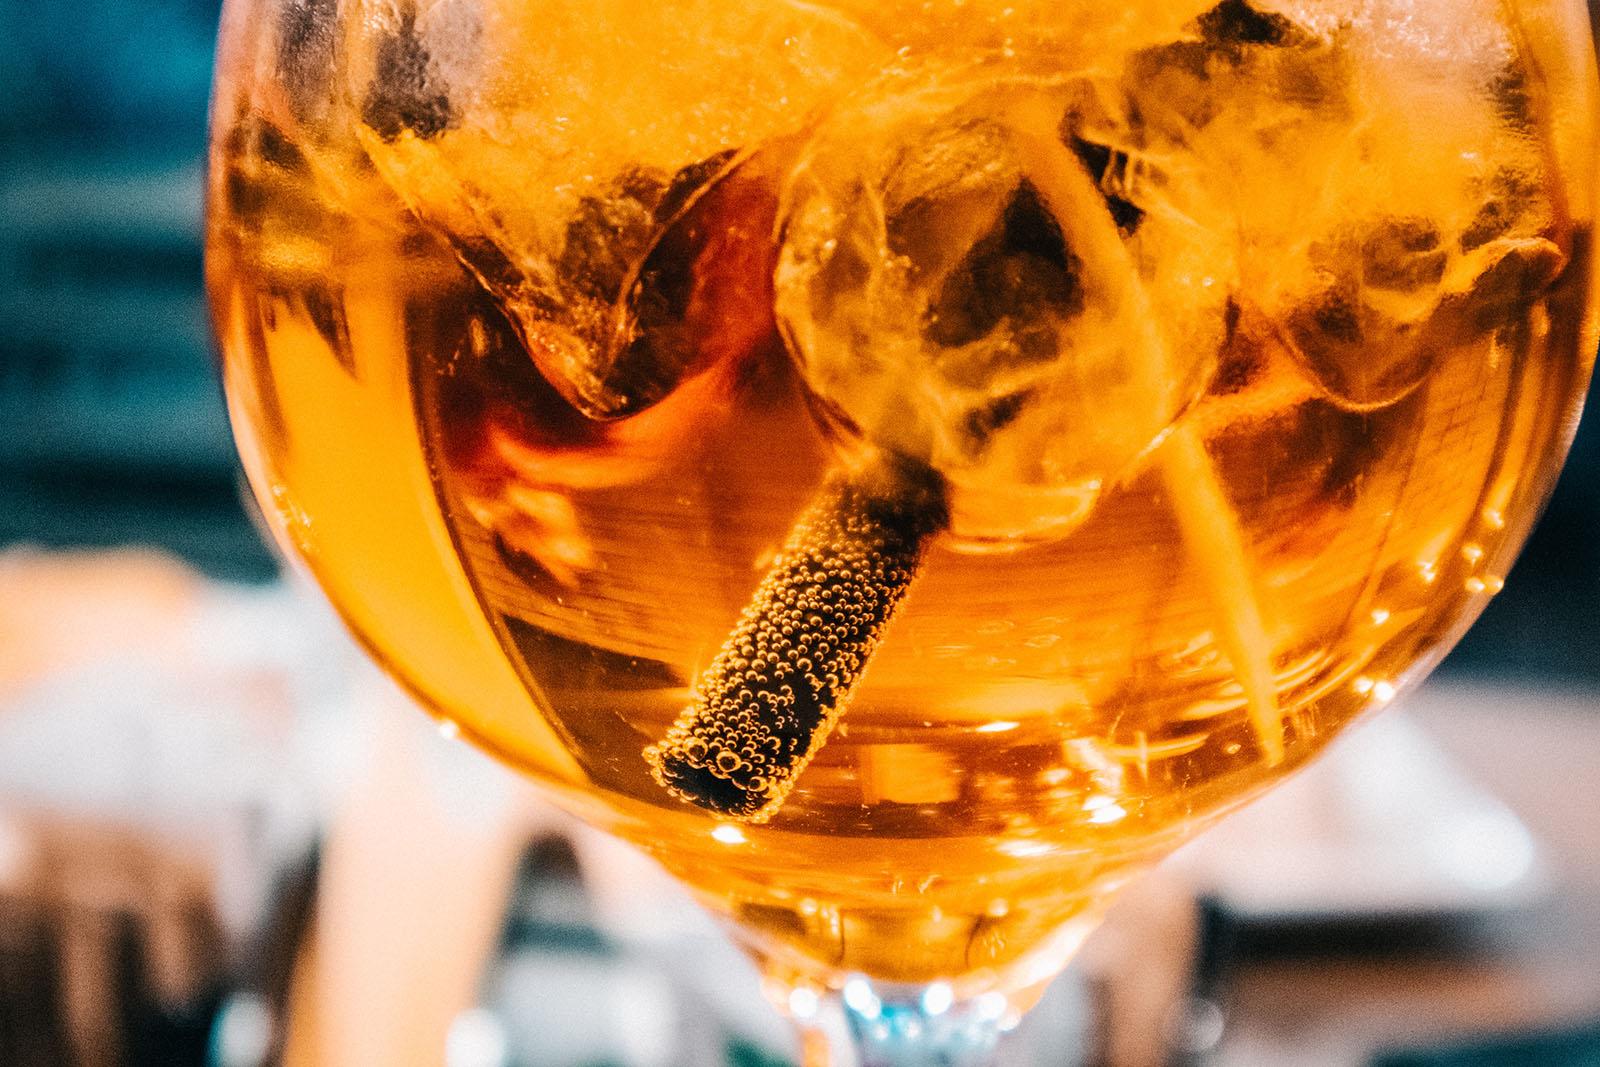 alcohol-beverage-blur-989701